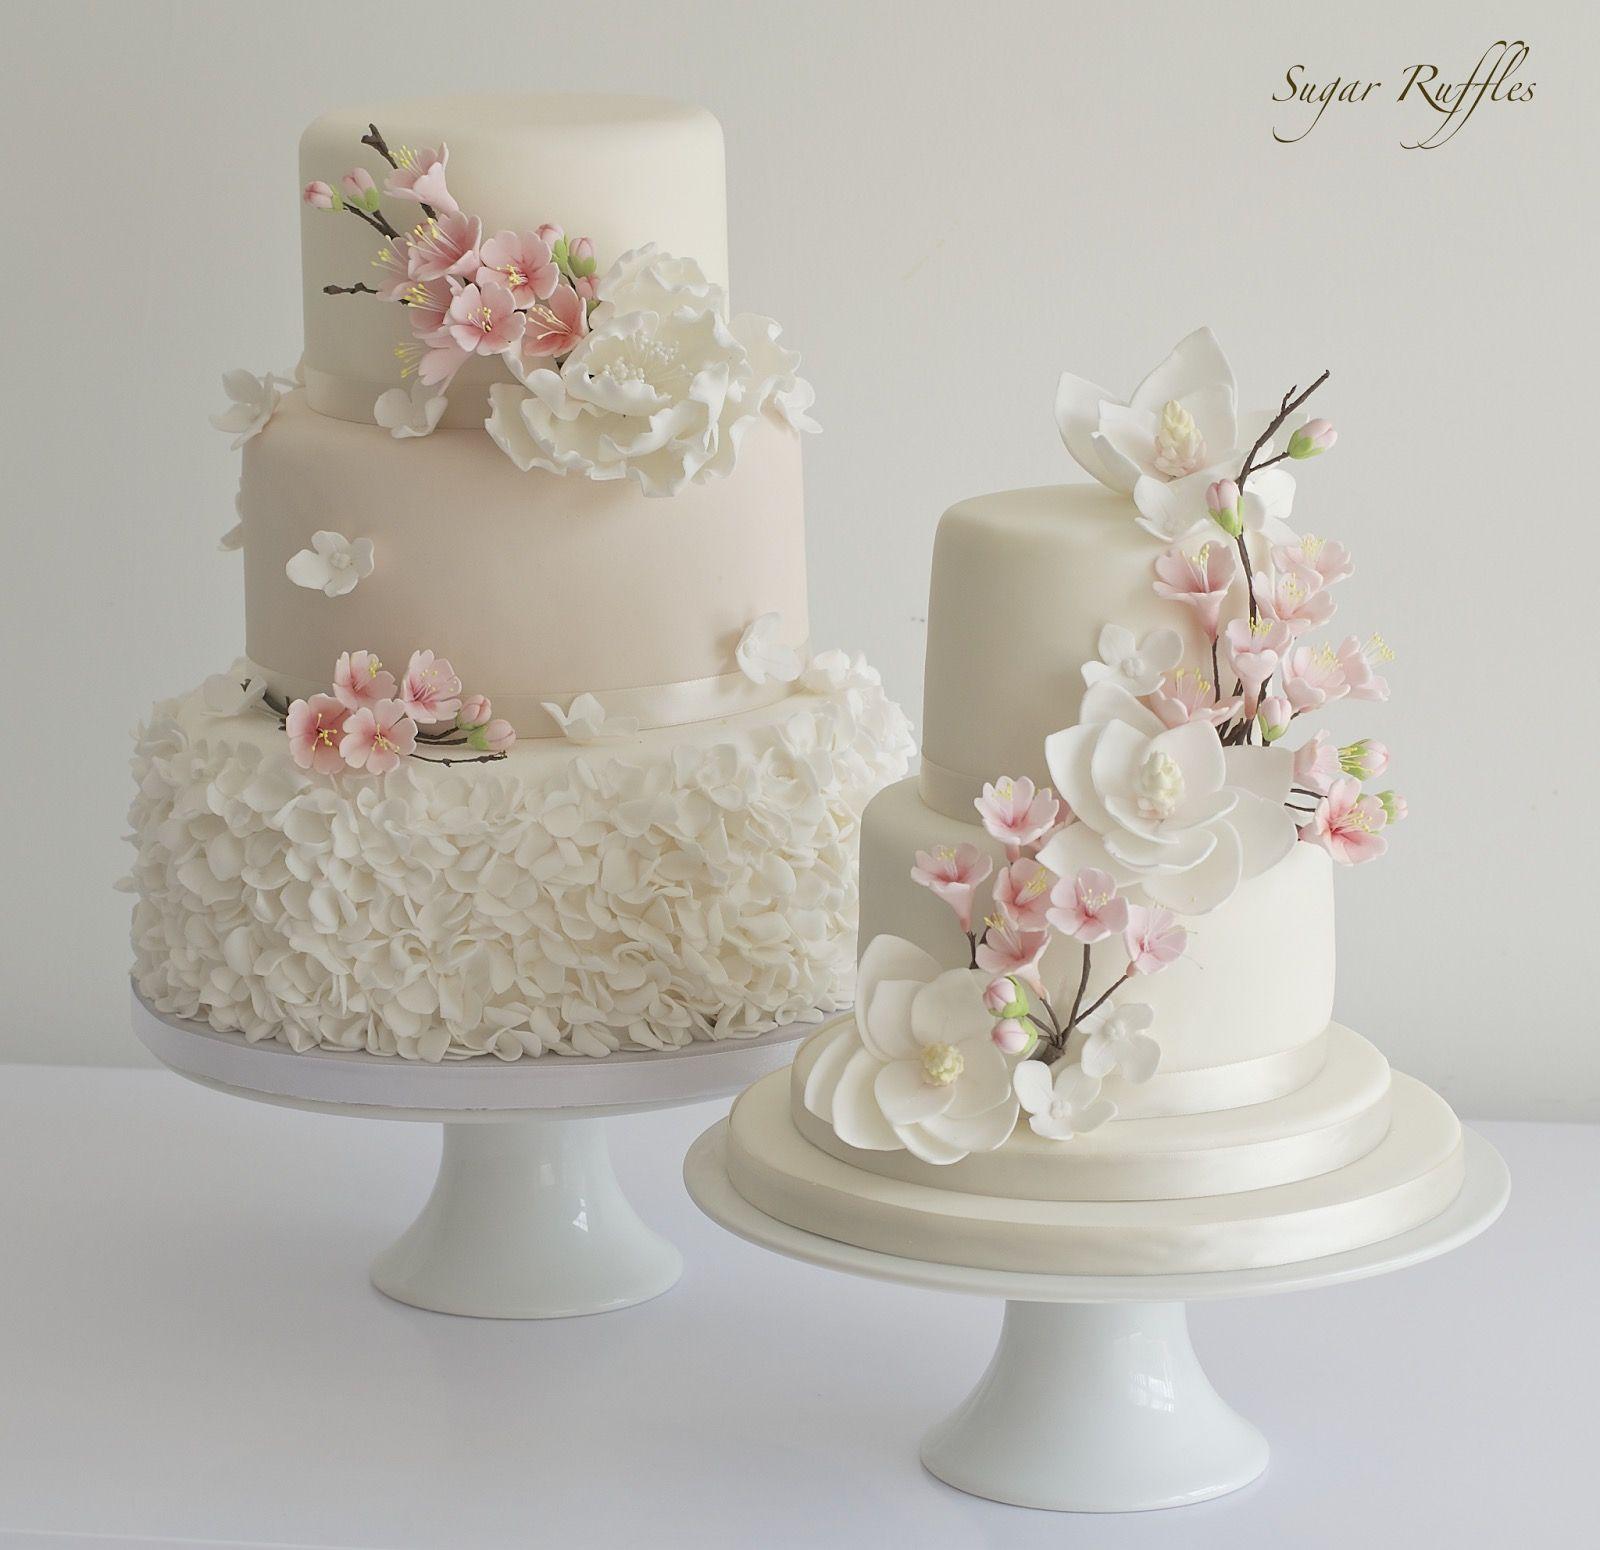 Pin by isobel murray on wedding cake ideas pinterest wedding